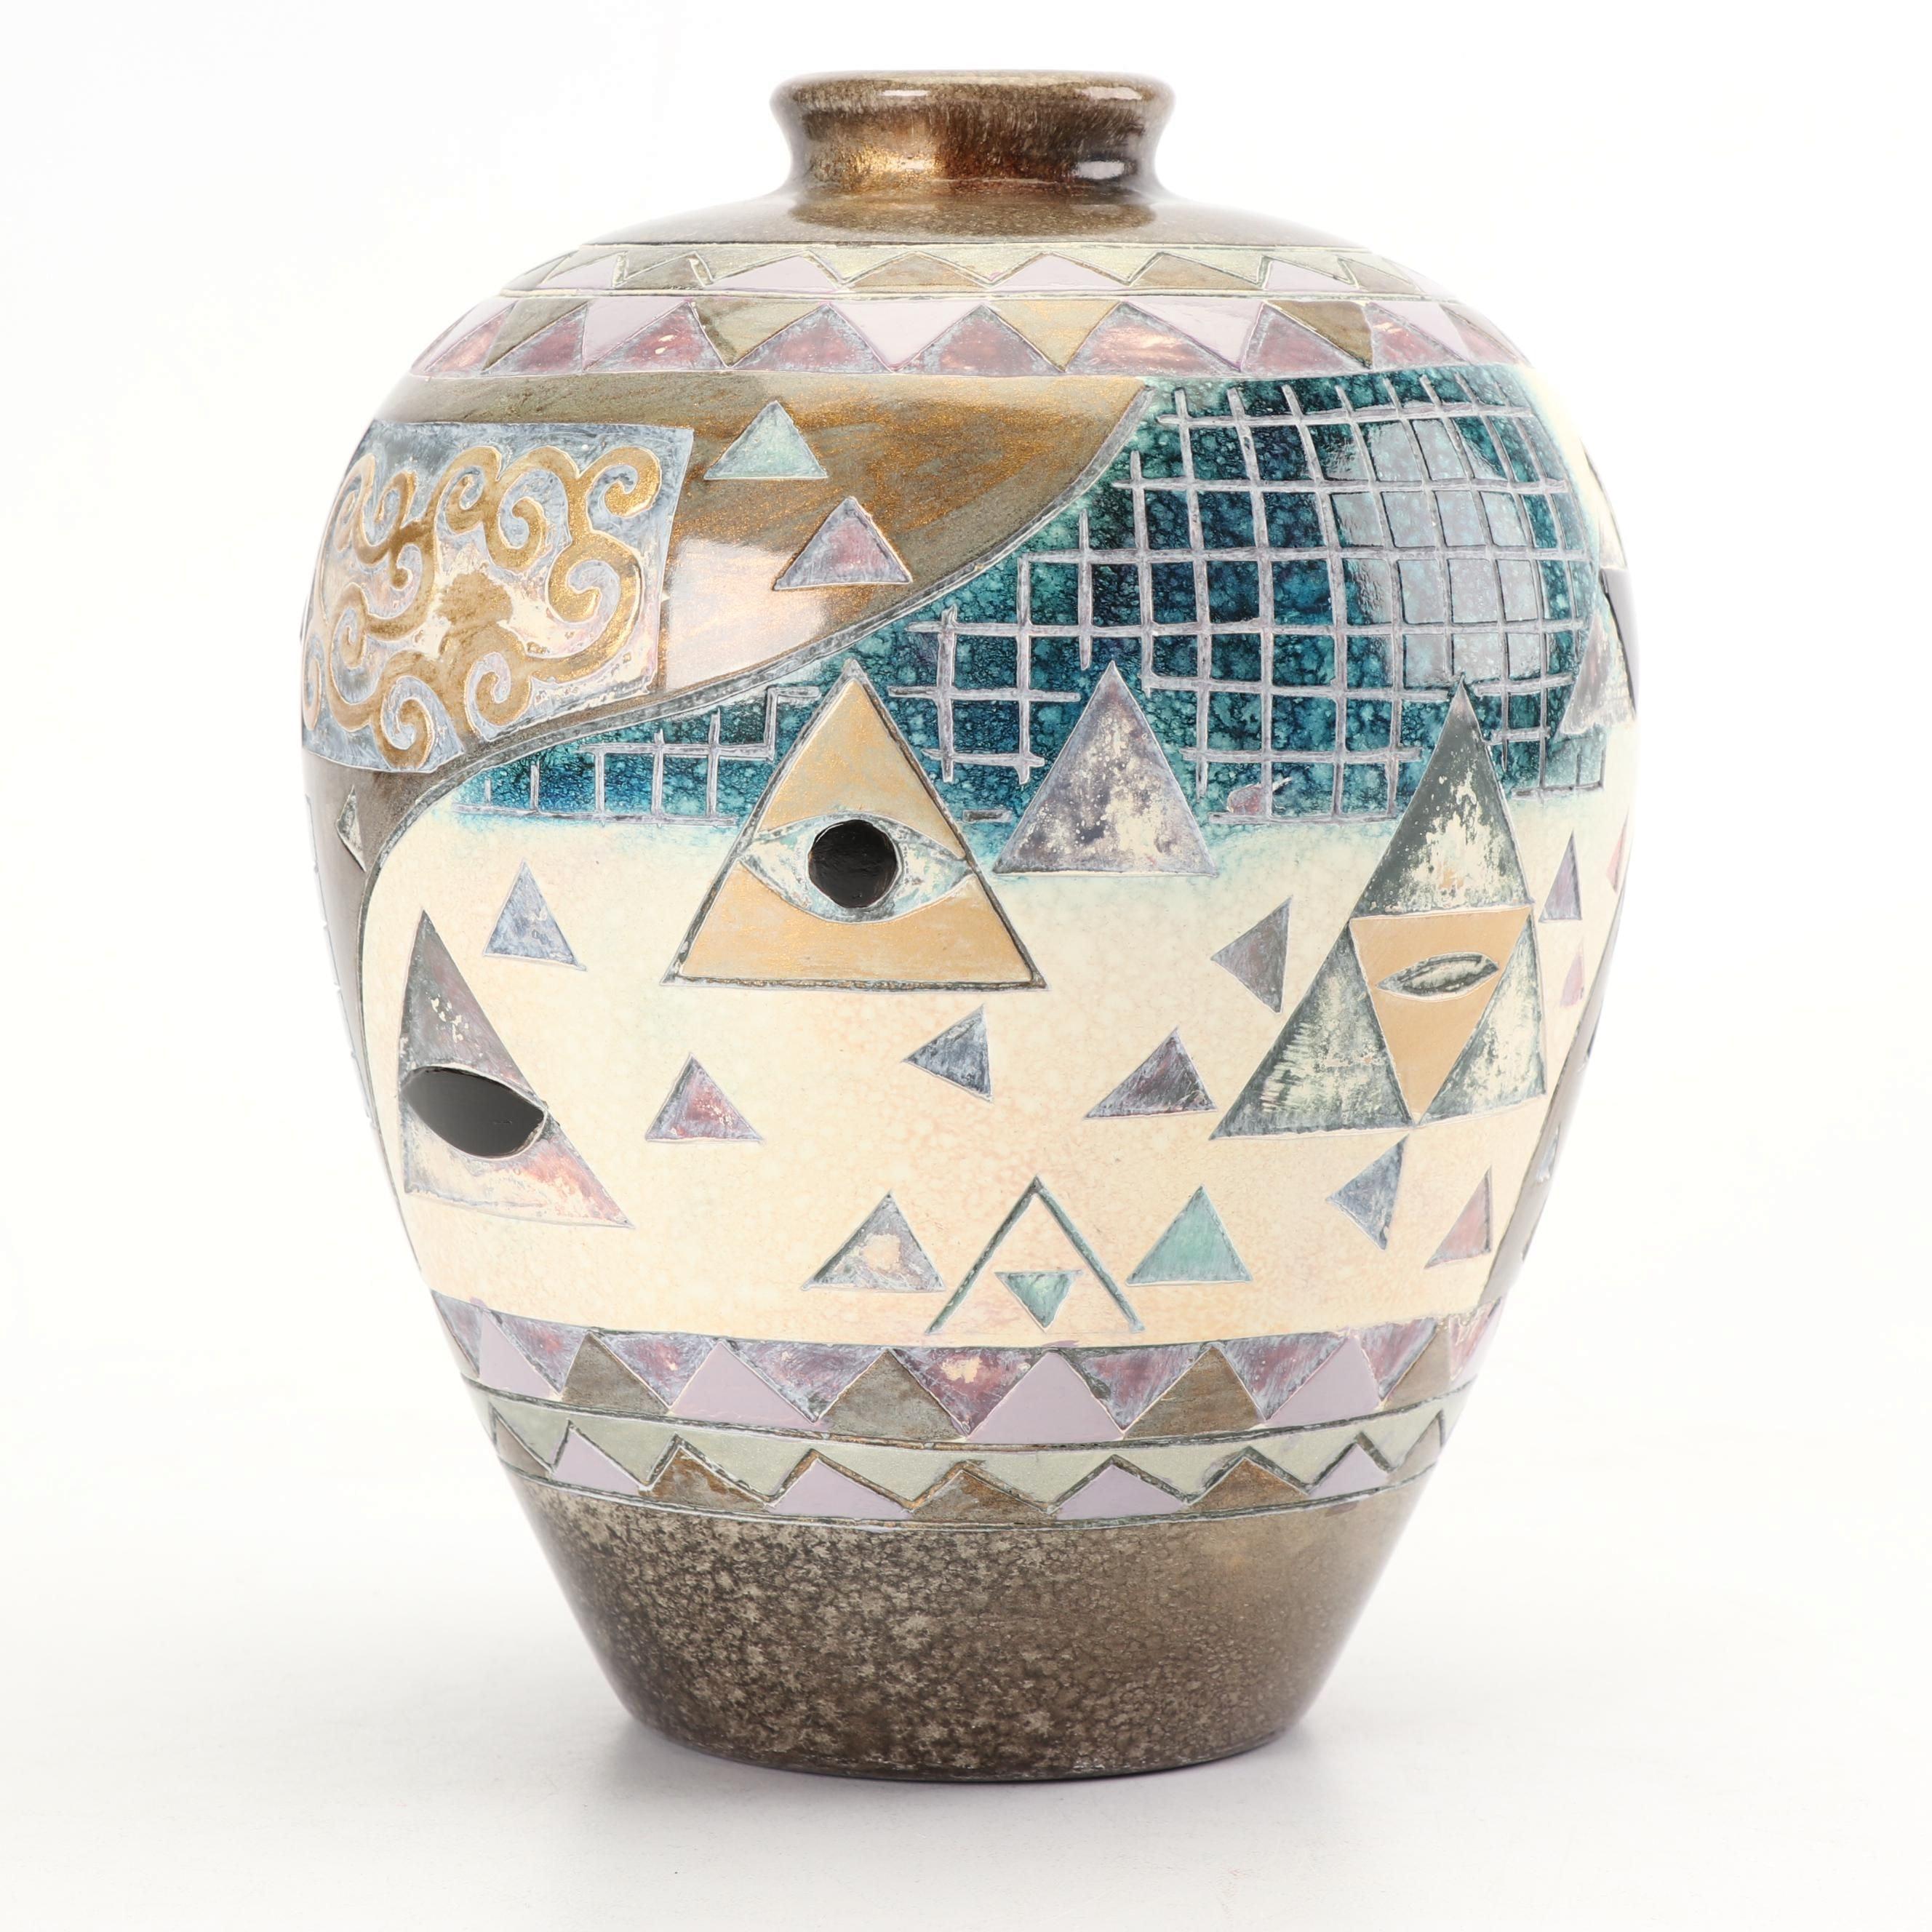 Decorative Chinese Ceramic Urn